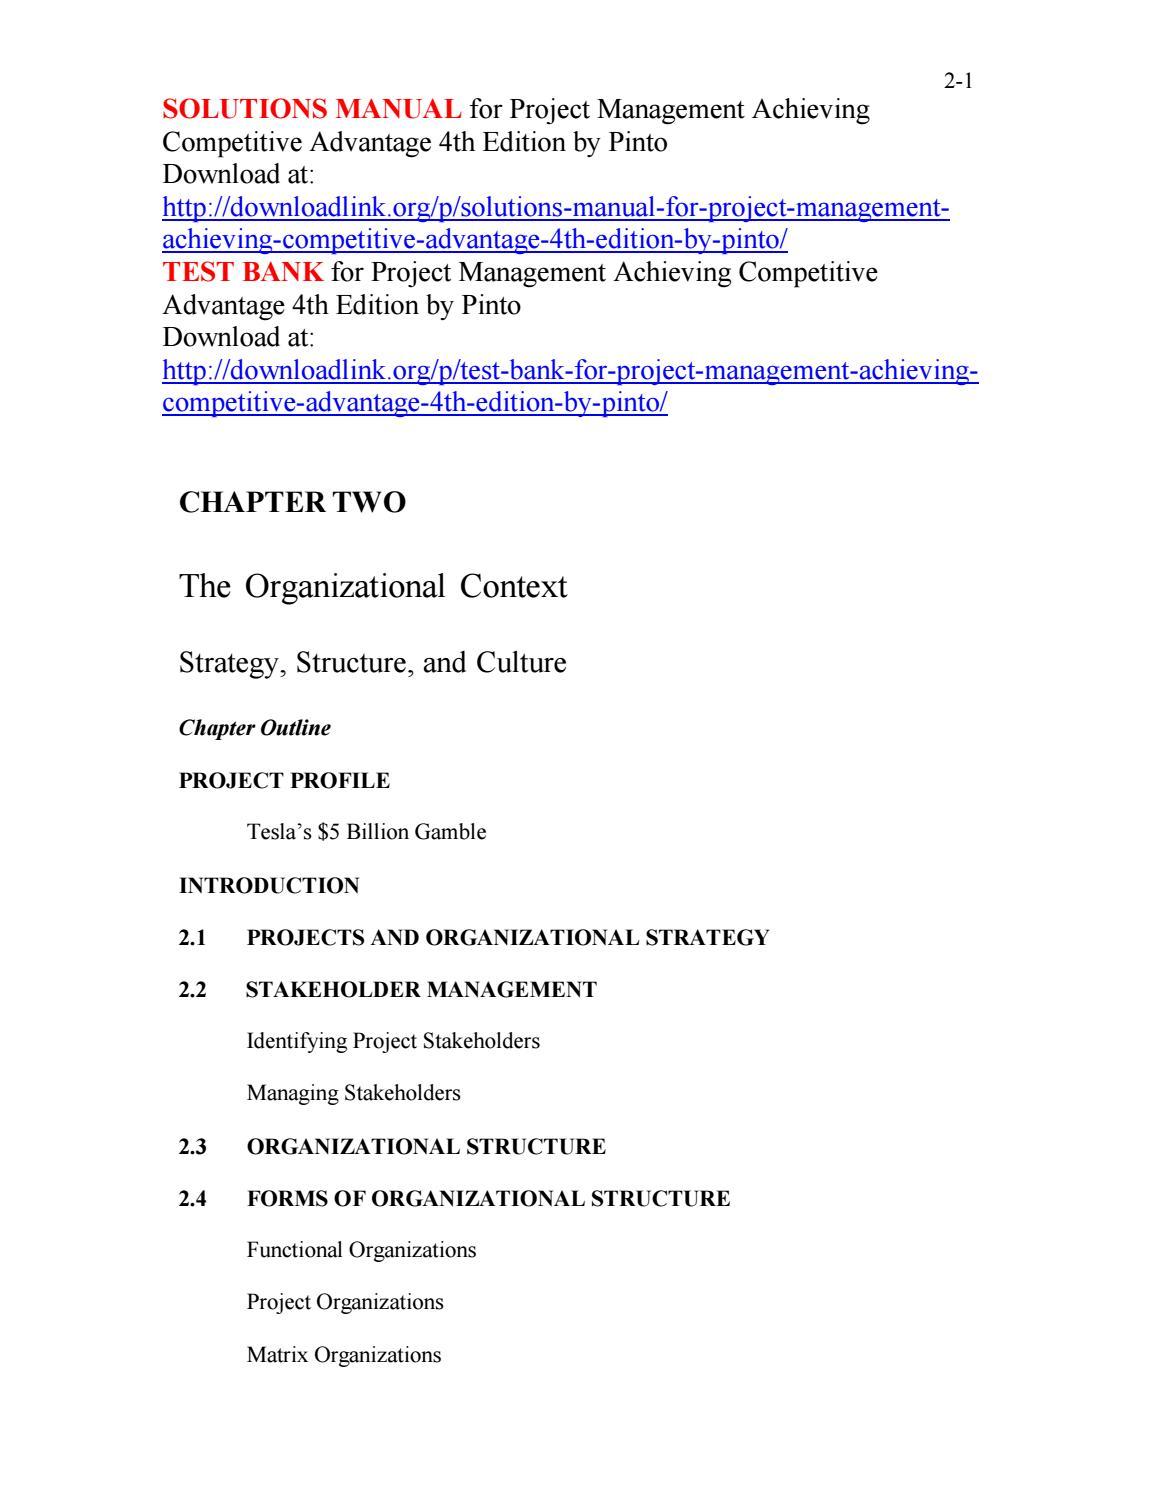 project management achieving competitive advantage 4th edition ebook